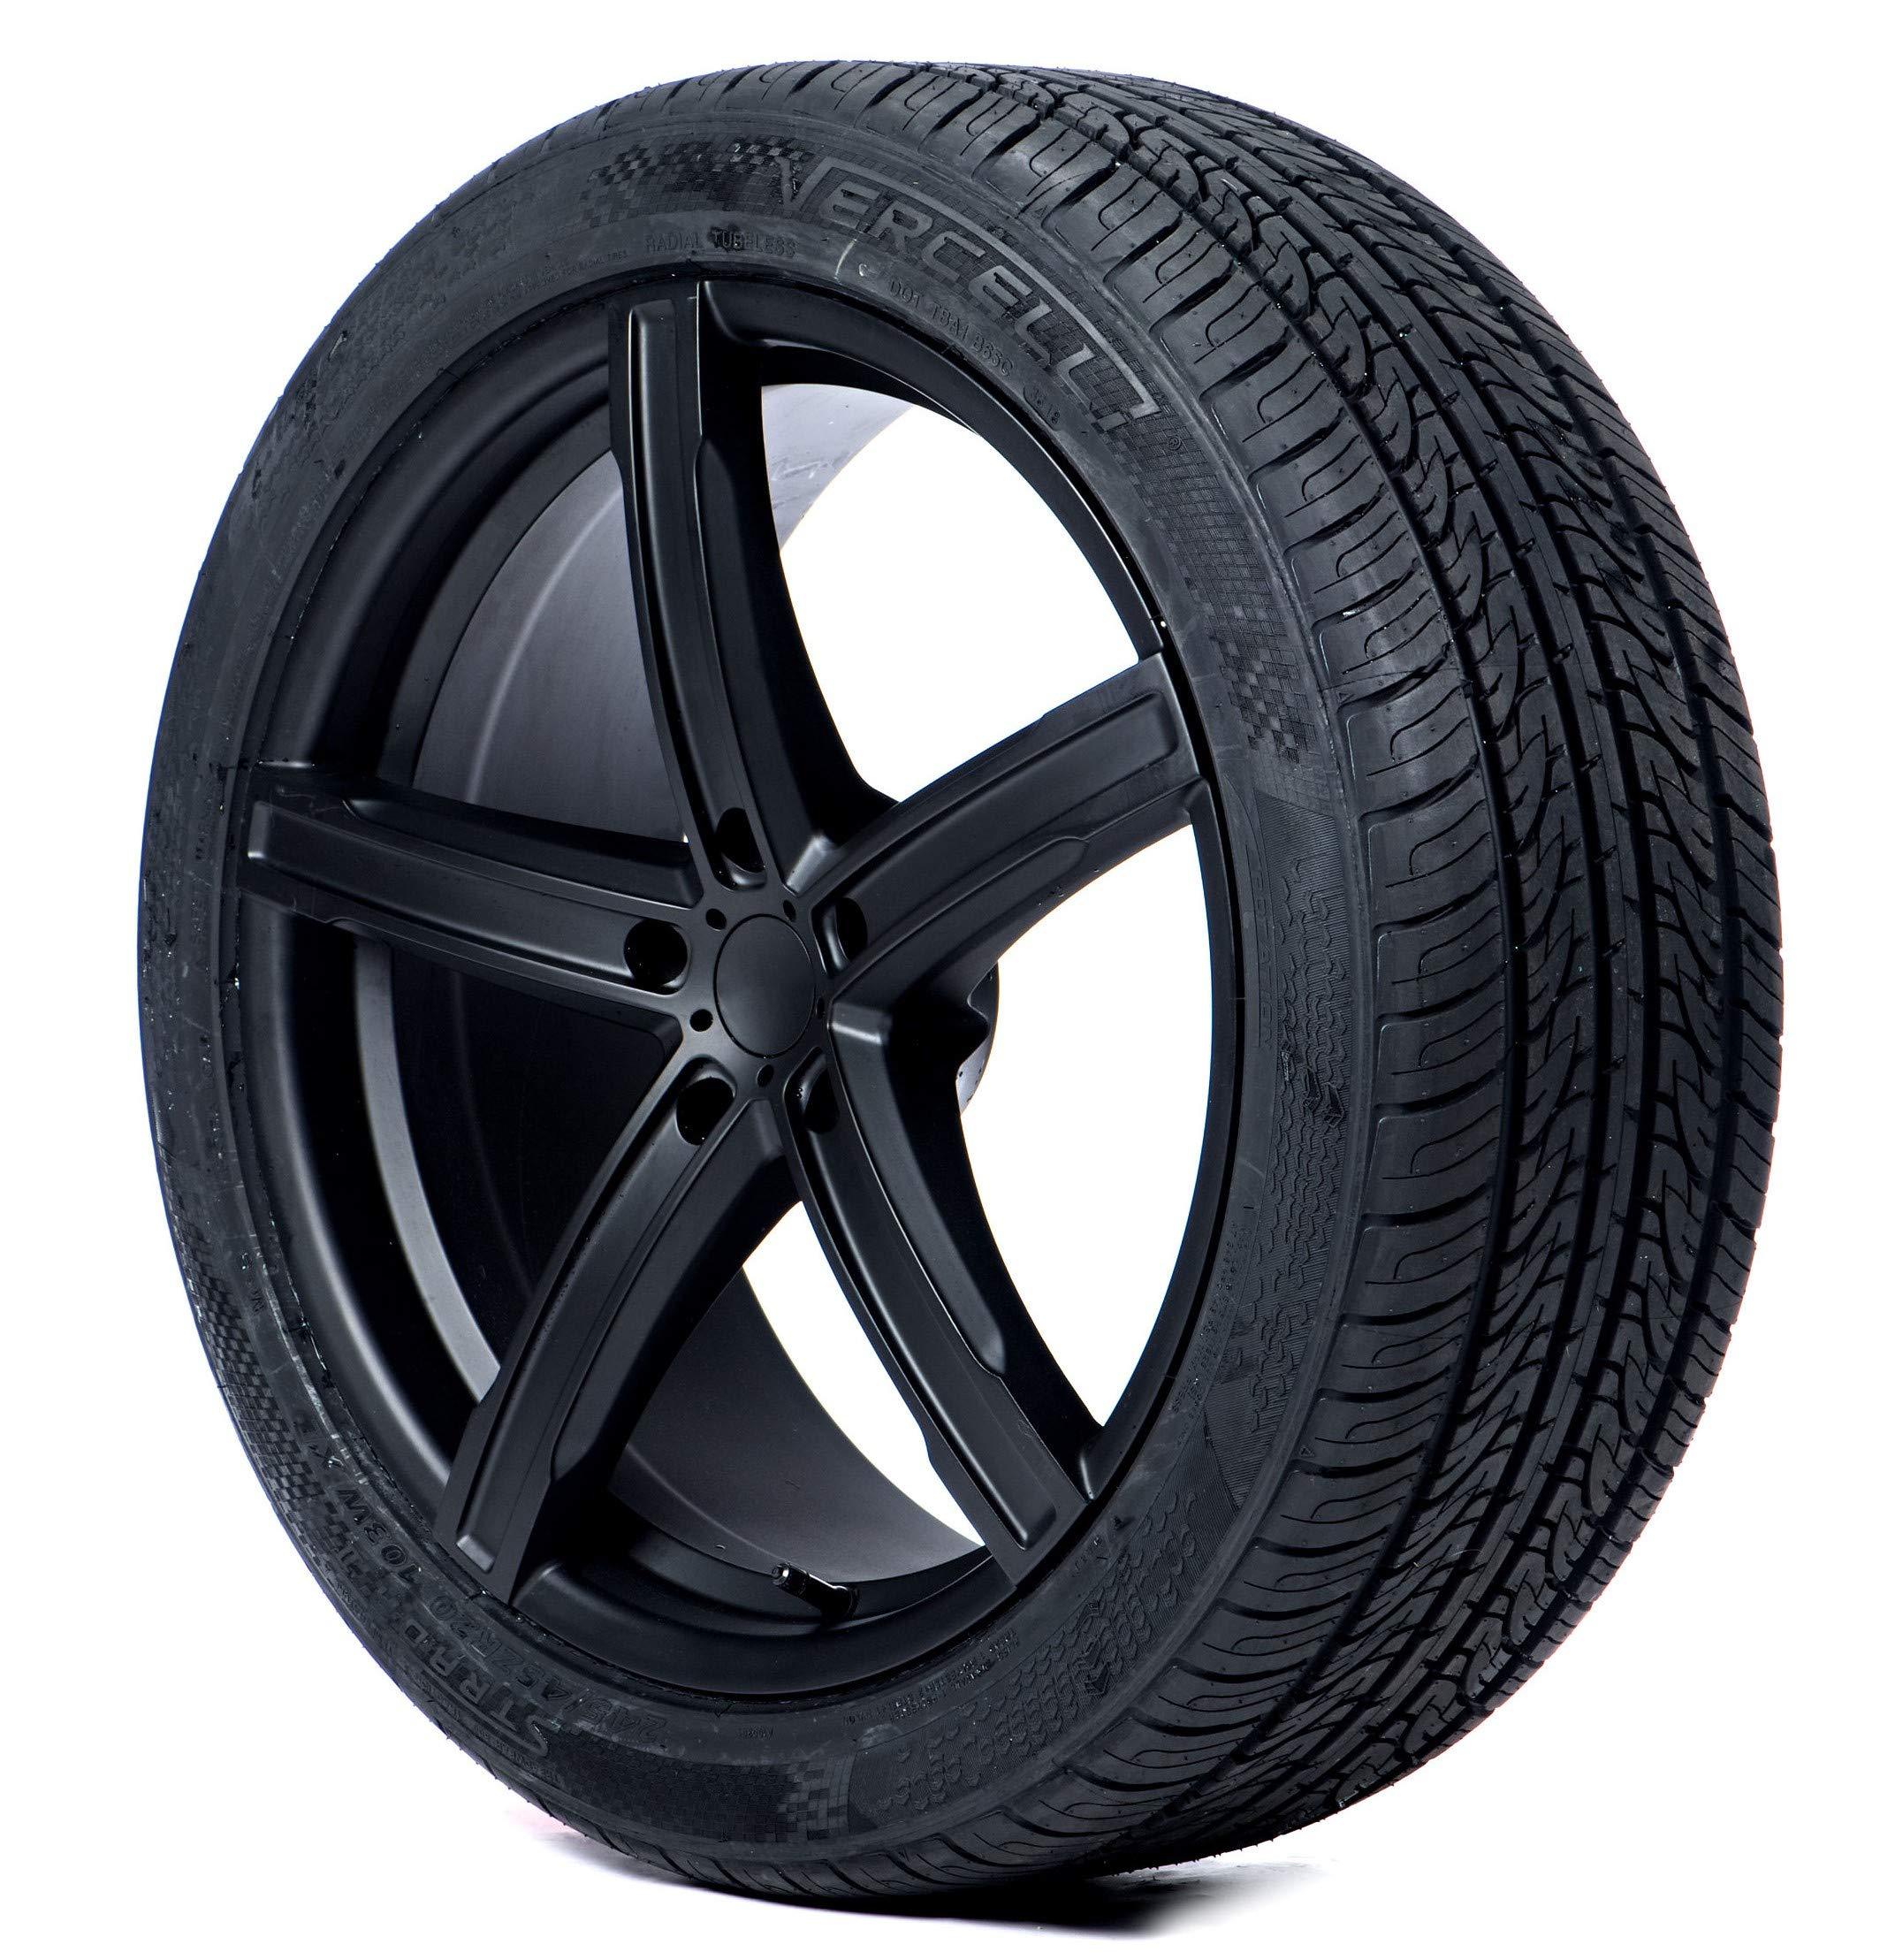 Vercelli Strada 2 All-Season Tire - 245/45R18 100W product image